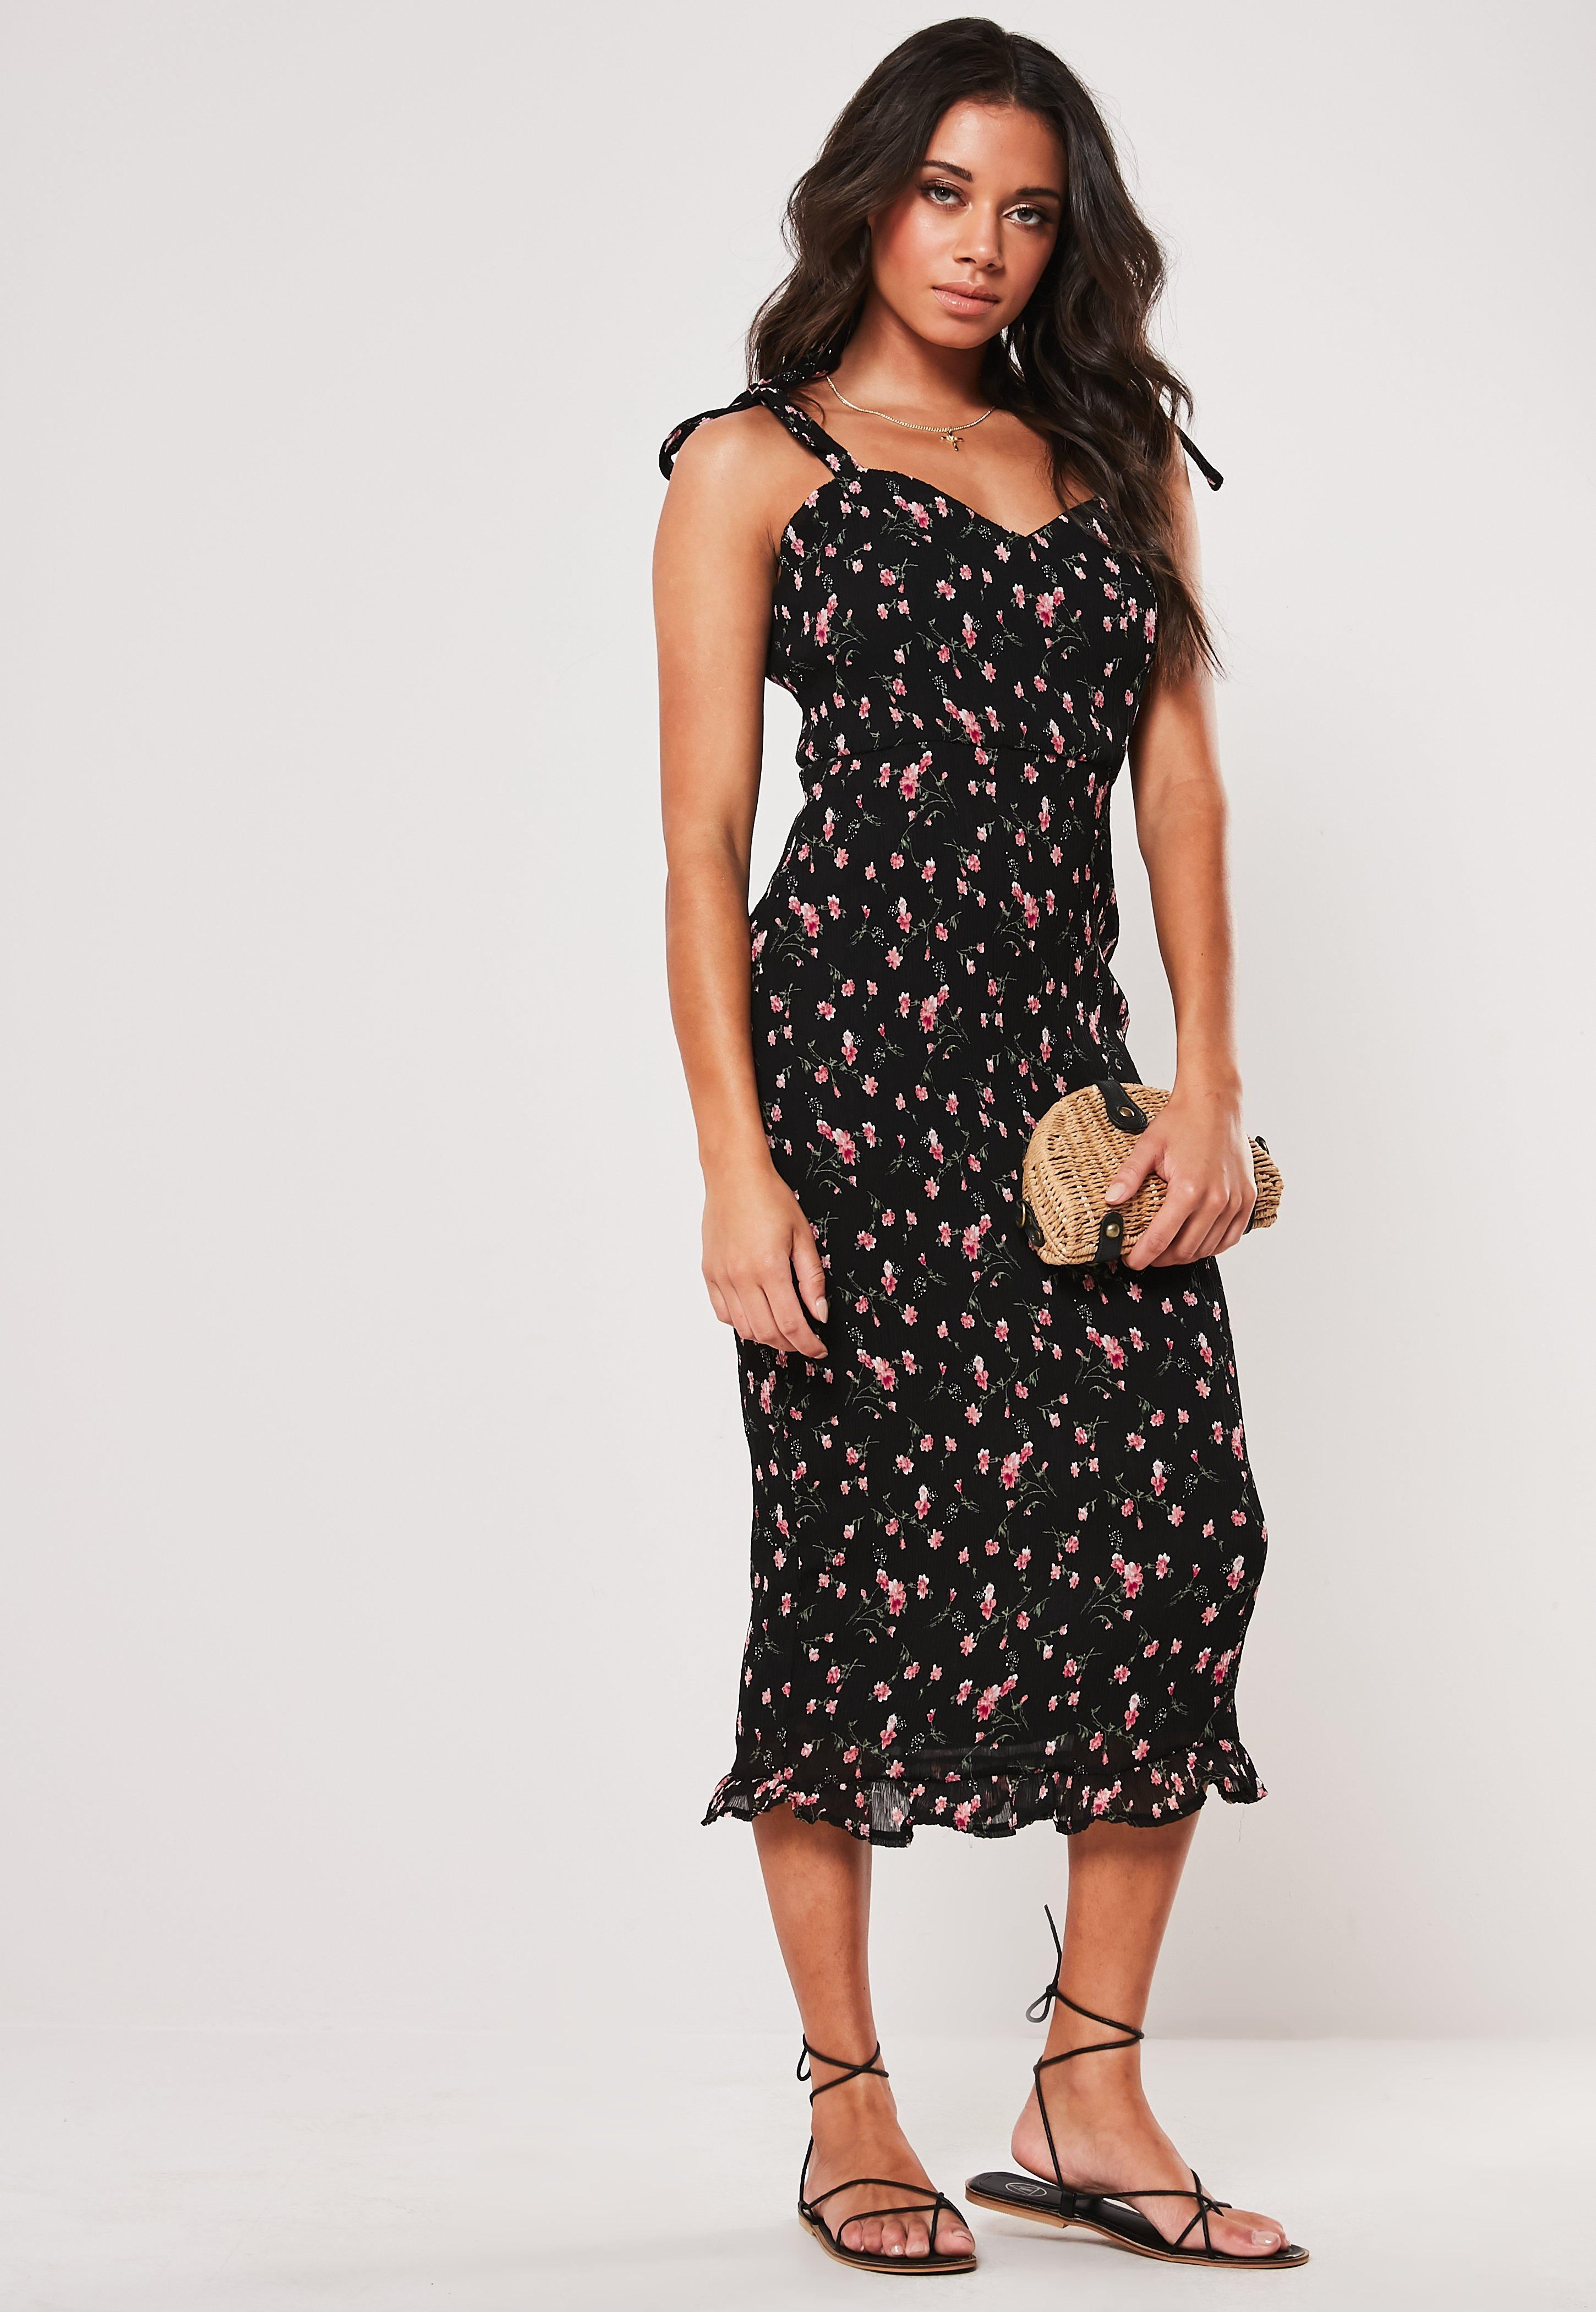 96bef2b9f76 Floral Dresses   Flower Print Dresses - Missguided Australia